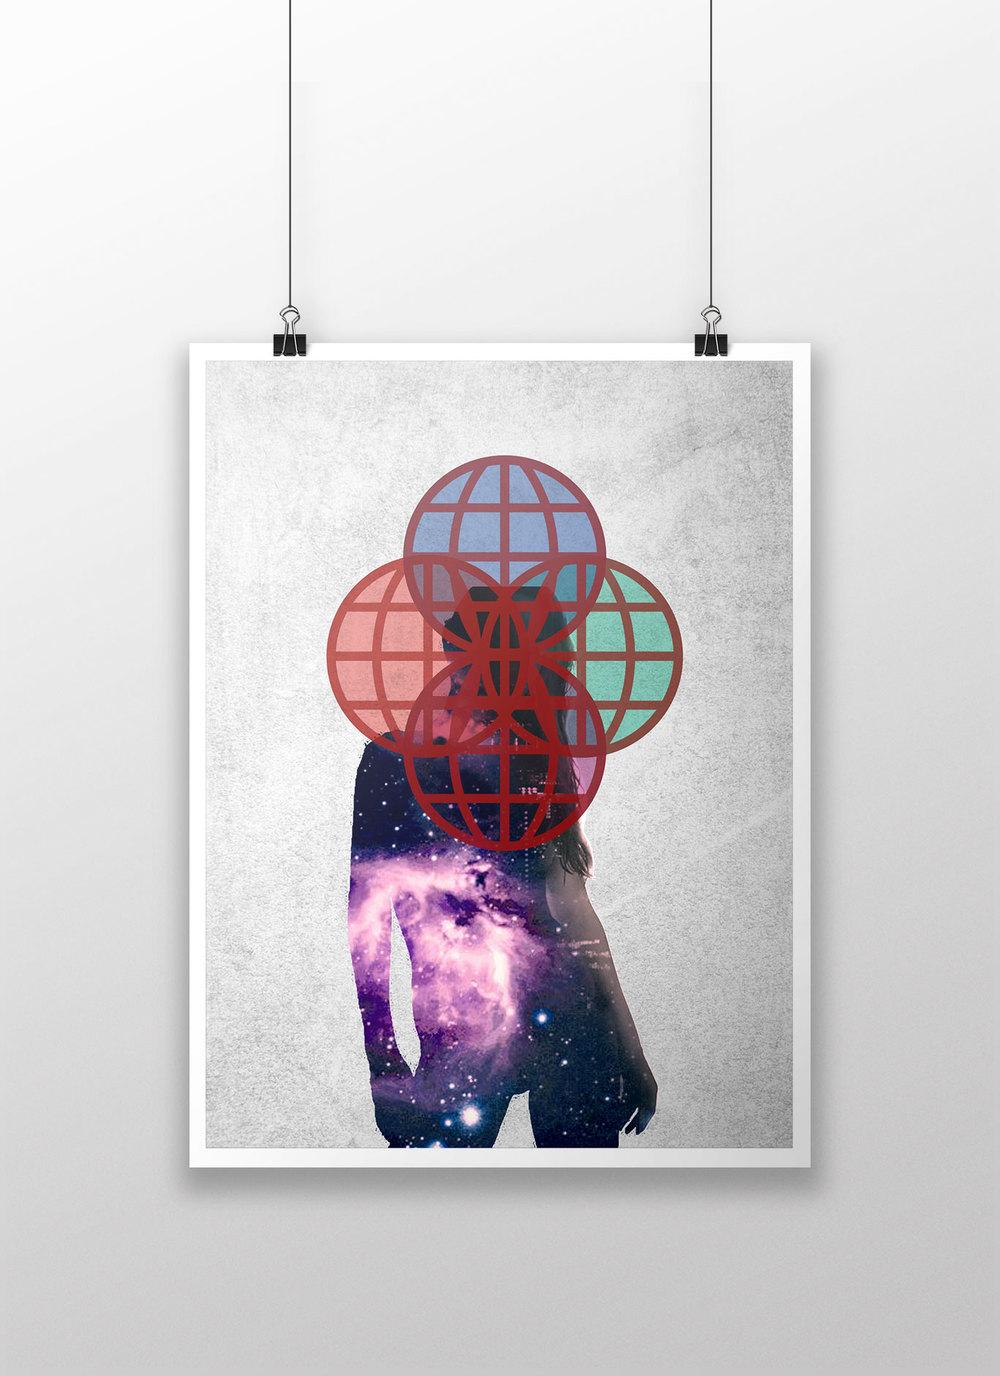 asp_poster3.jpg